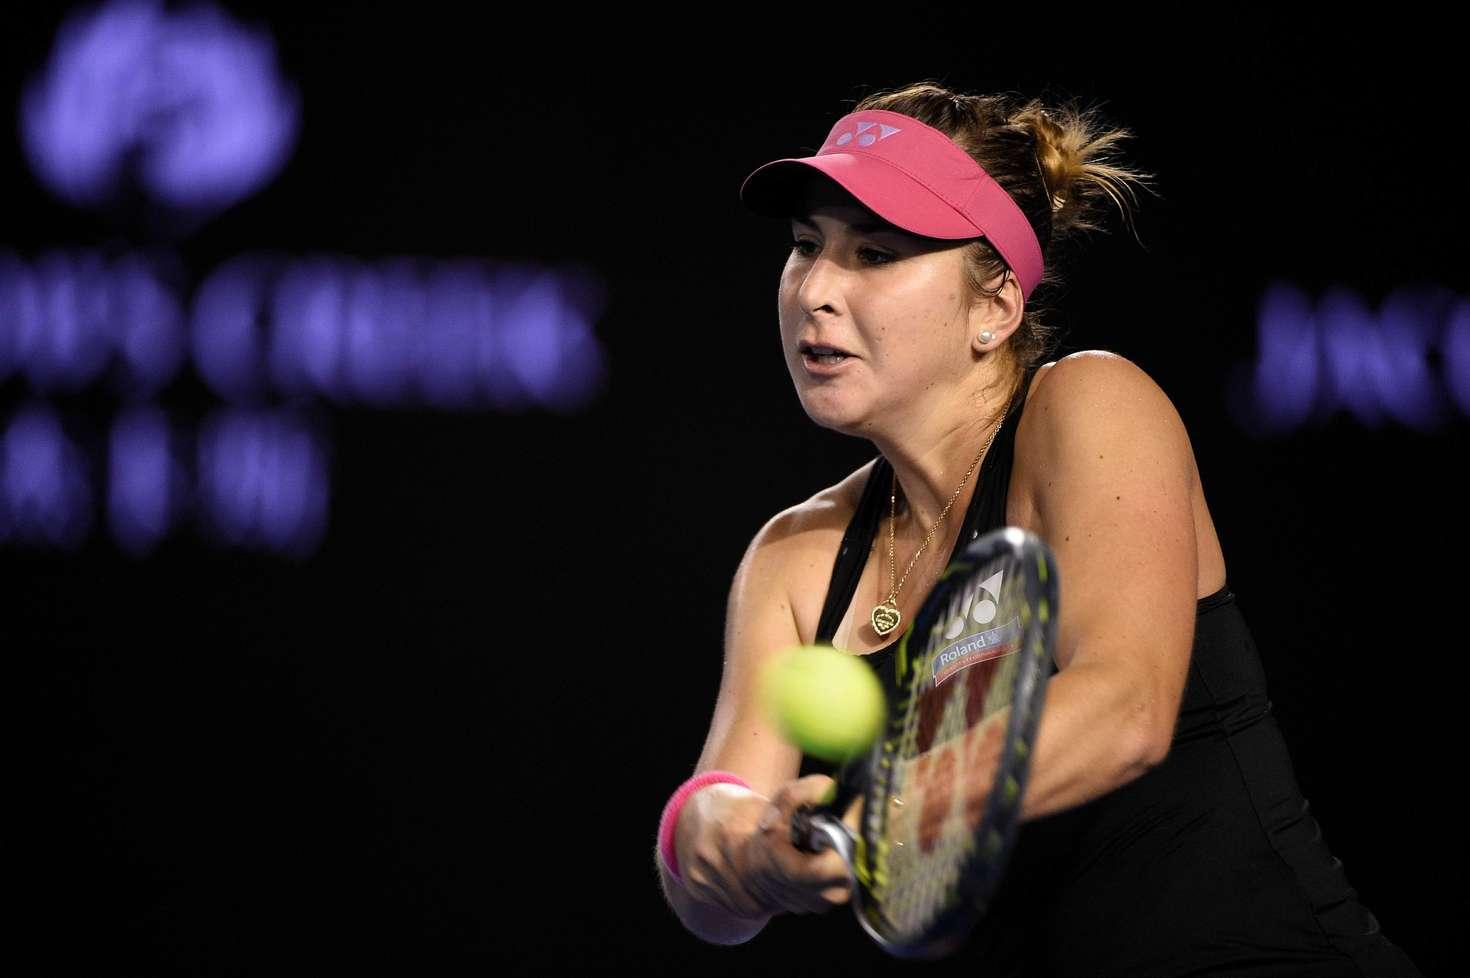 swiss tennis player belinda bencic hot images in black